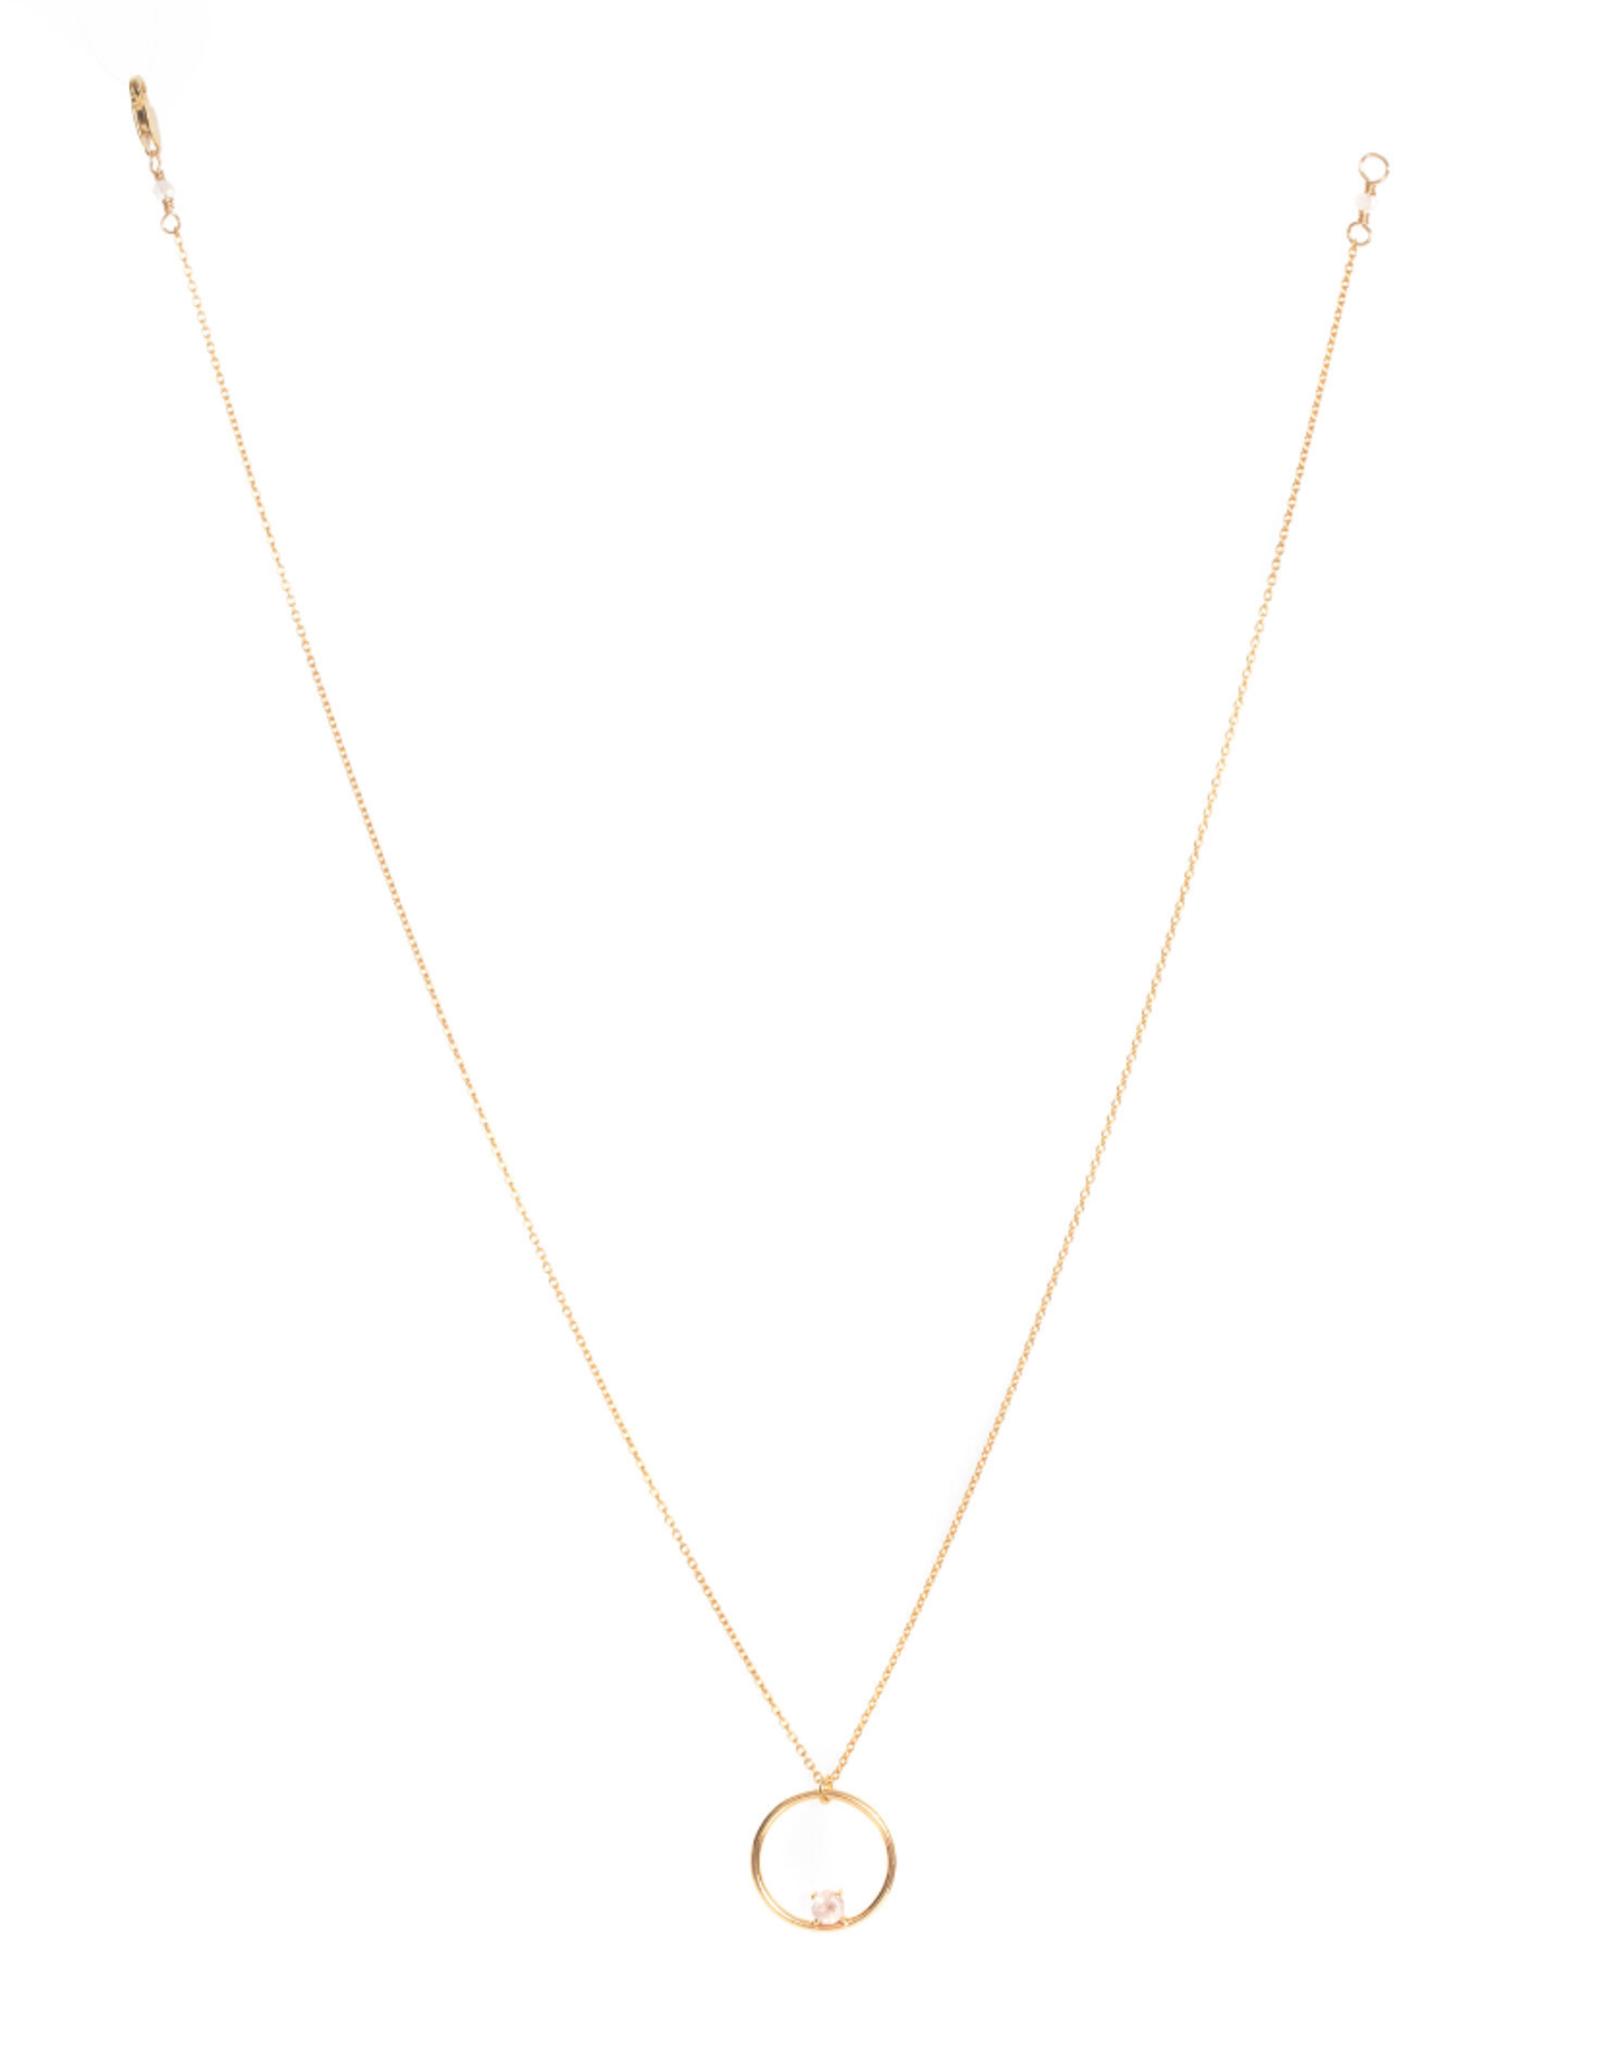 Hailey Gerrits Beech Necklace